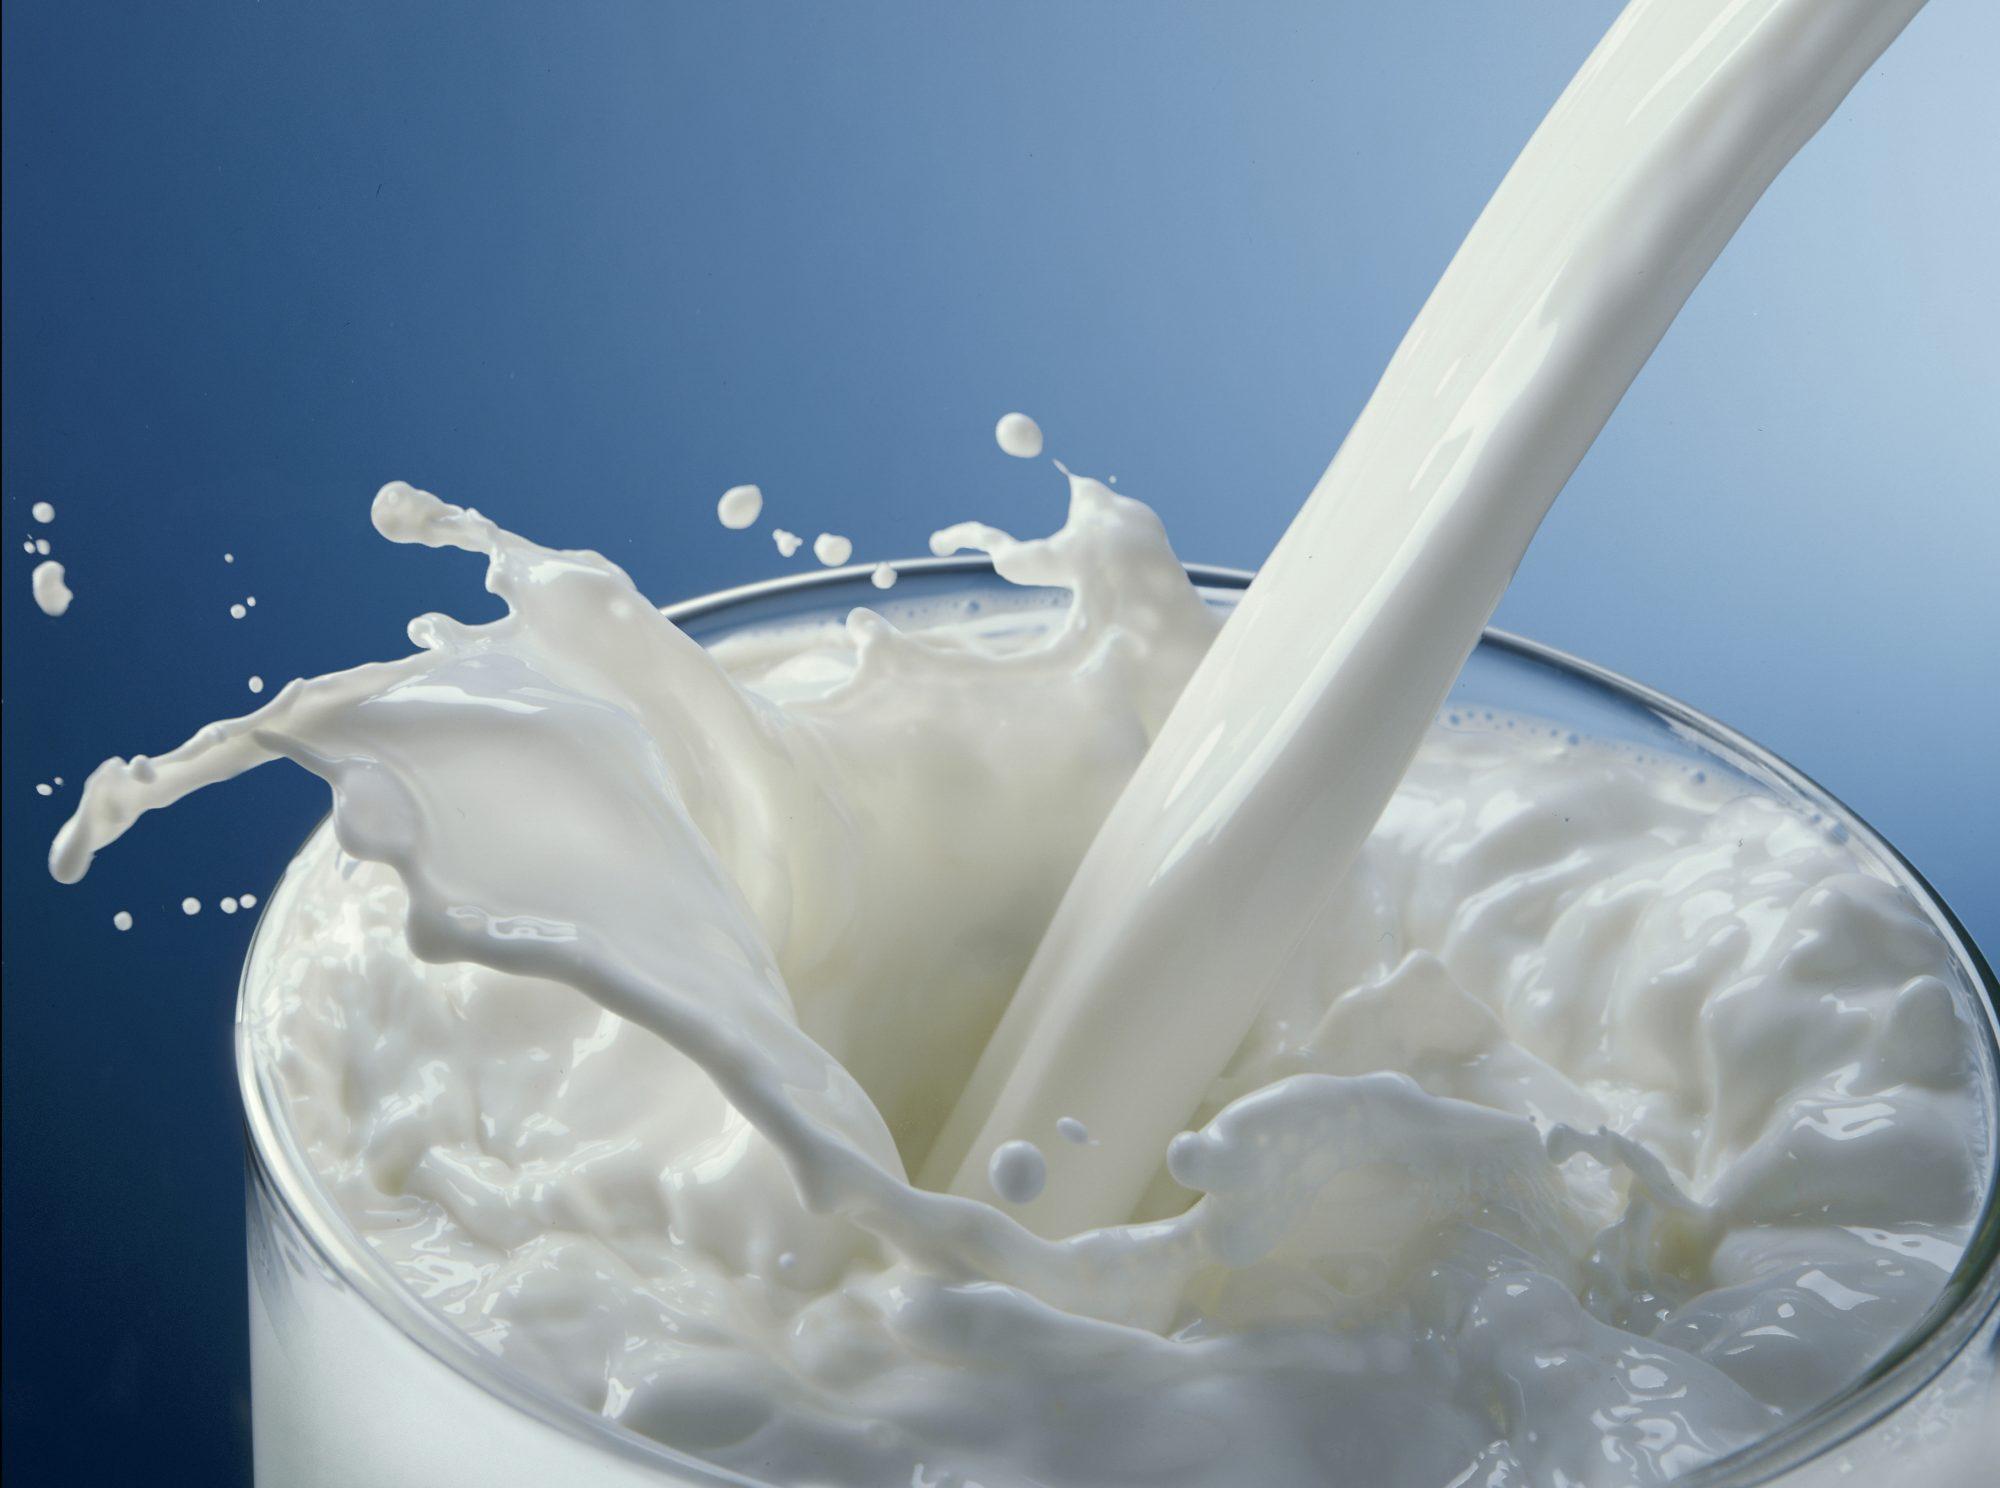 Milk Getty 2/26/20